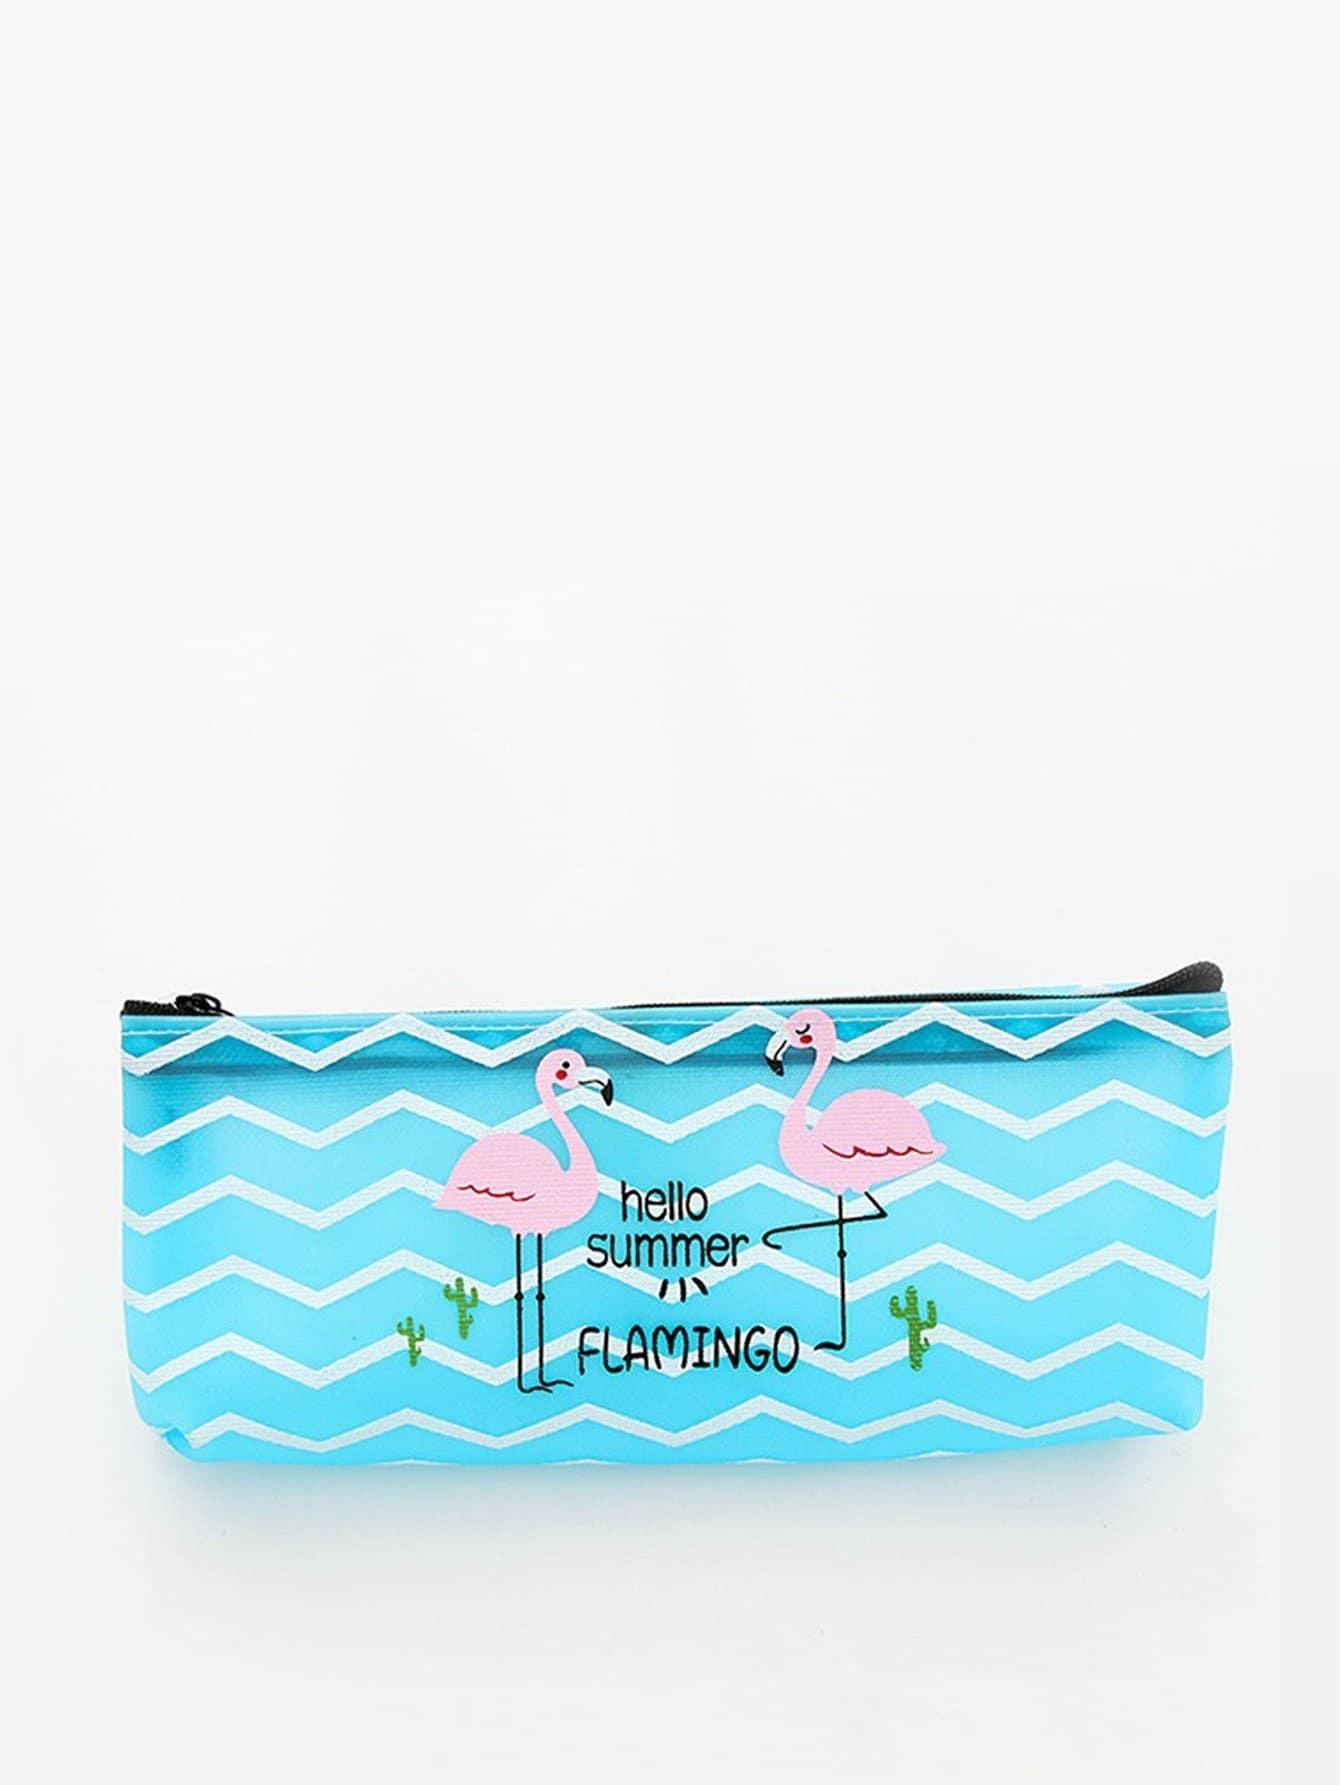 Flamingo Print Zigzag Pencil Case